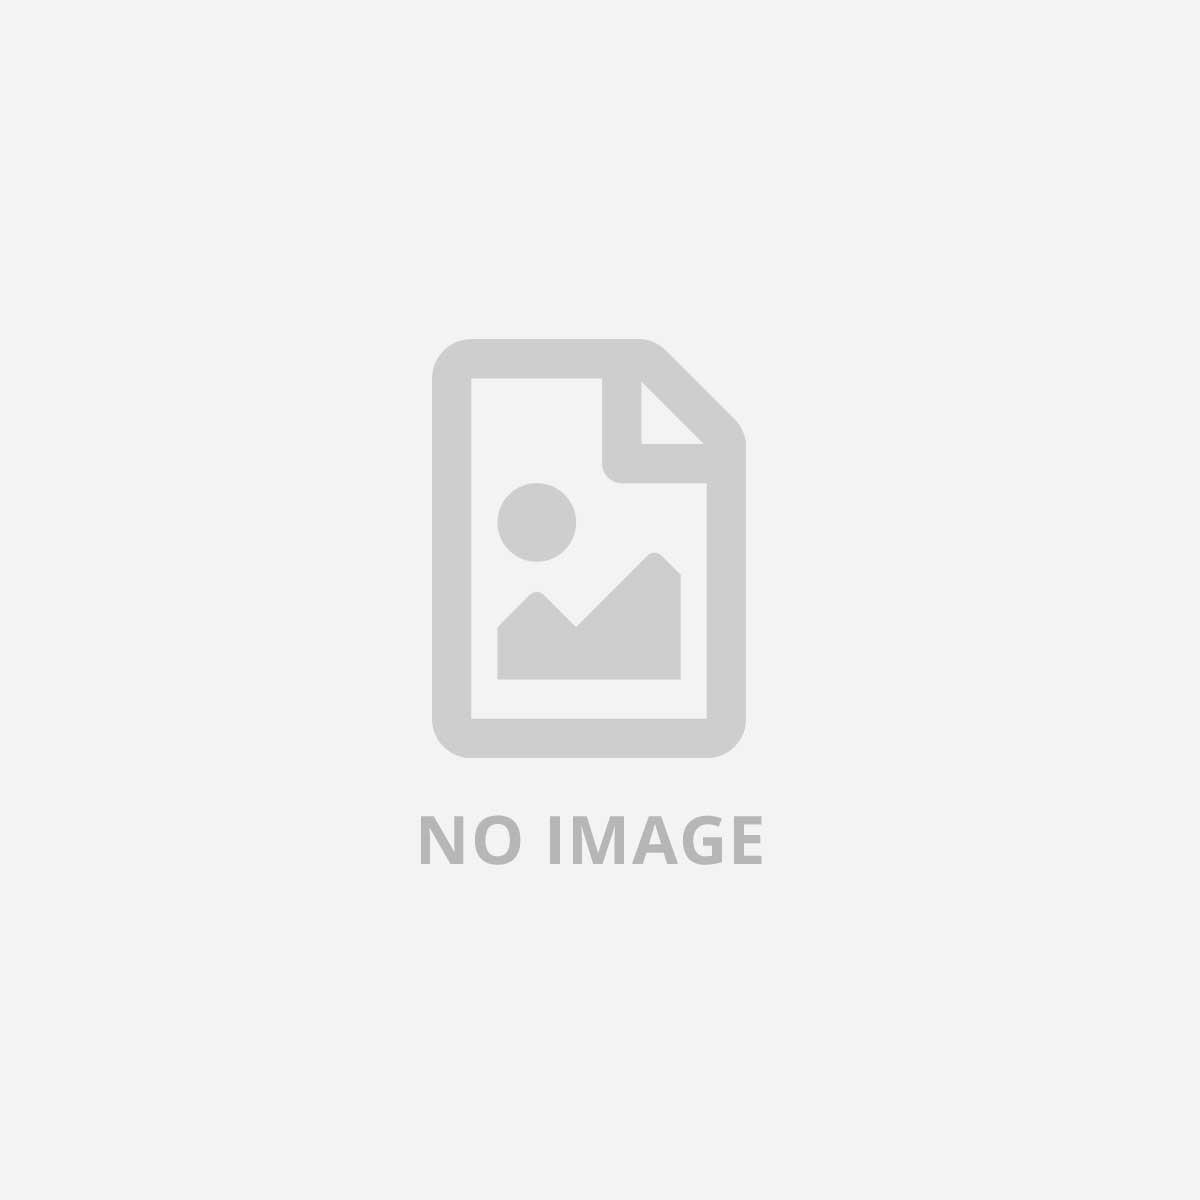 ELECTROLUX MACCHINA CAFFE E4CM1-4ST 1080W INOX